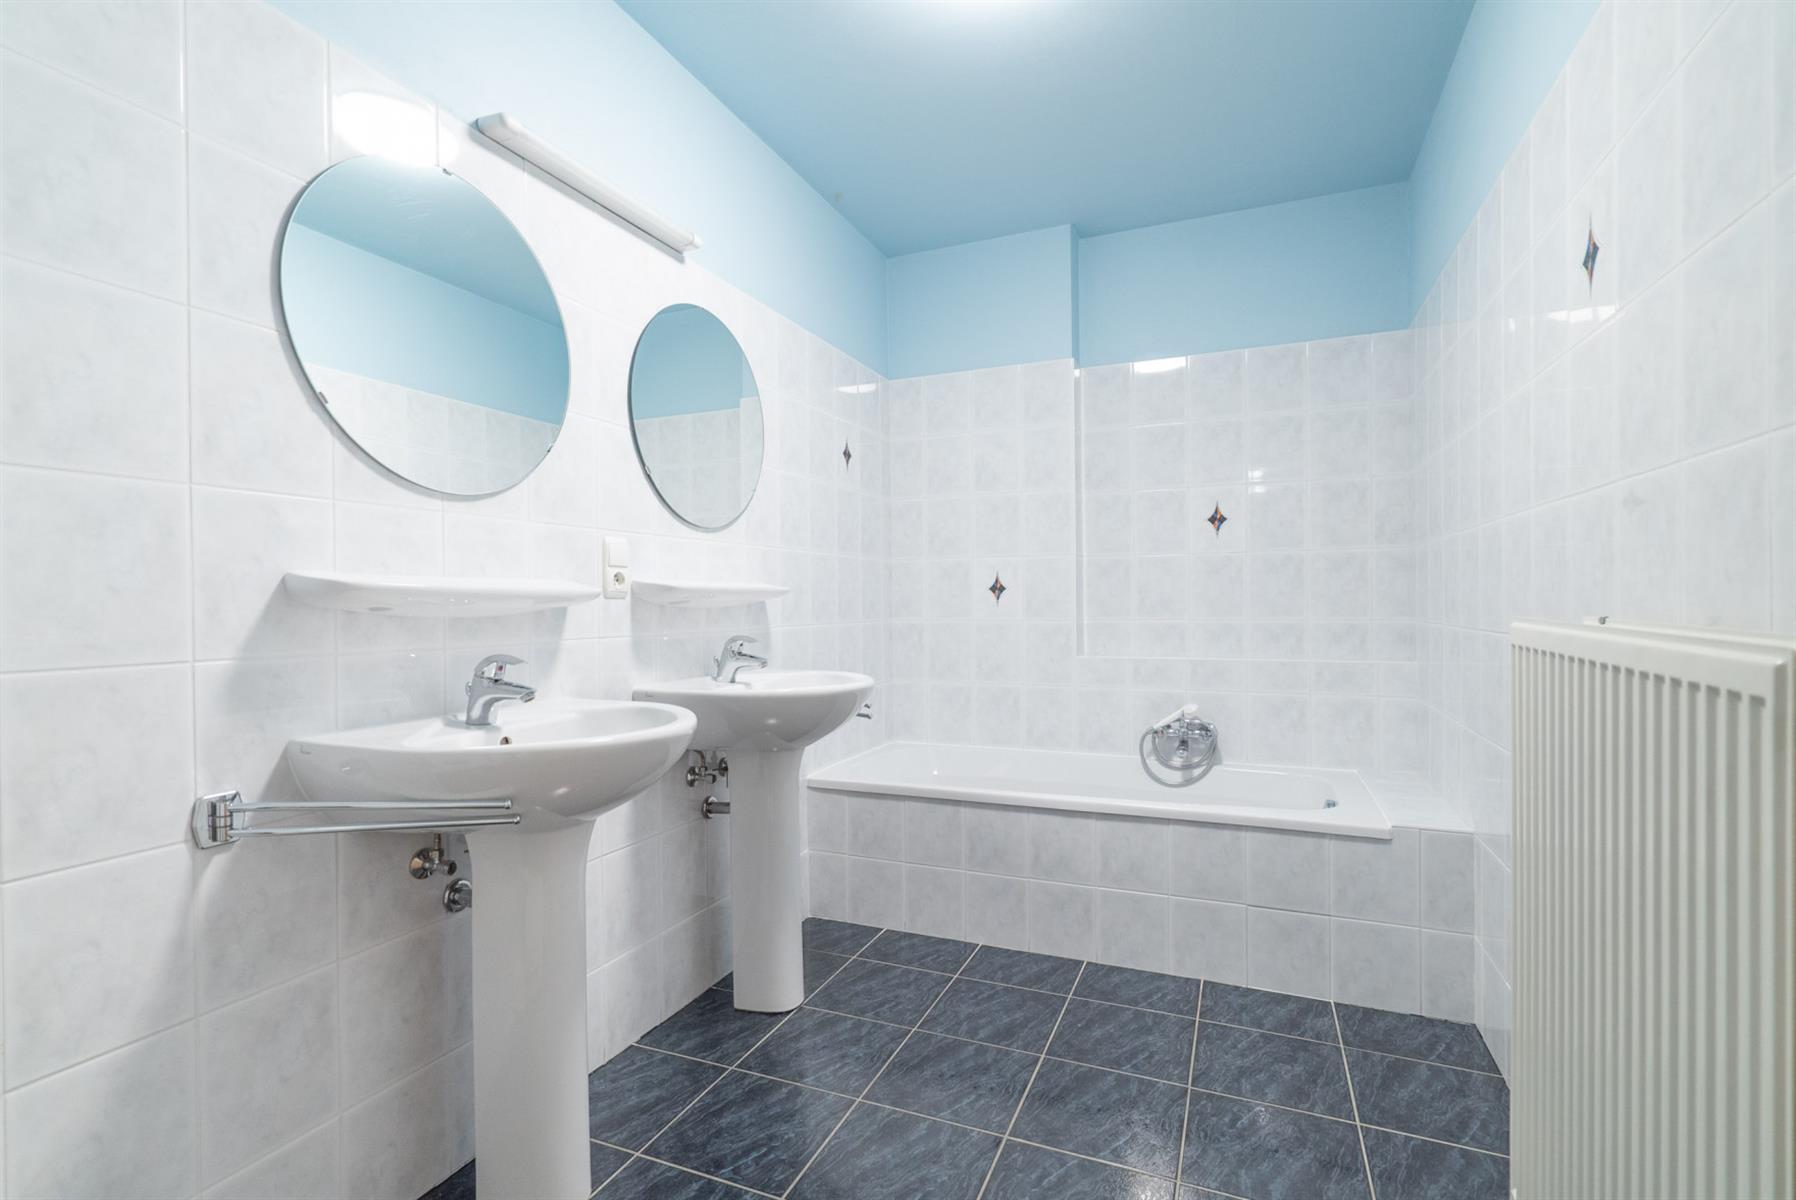 Appartement - Jalhay - #4305578-9